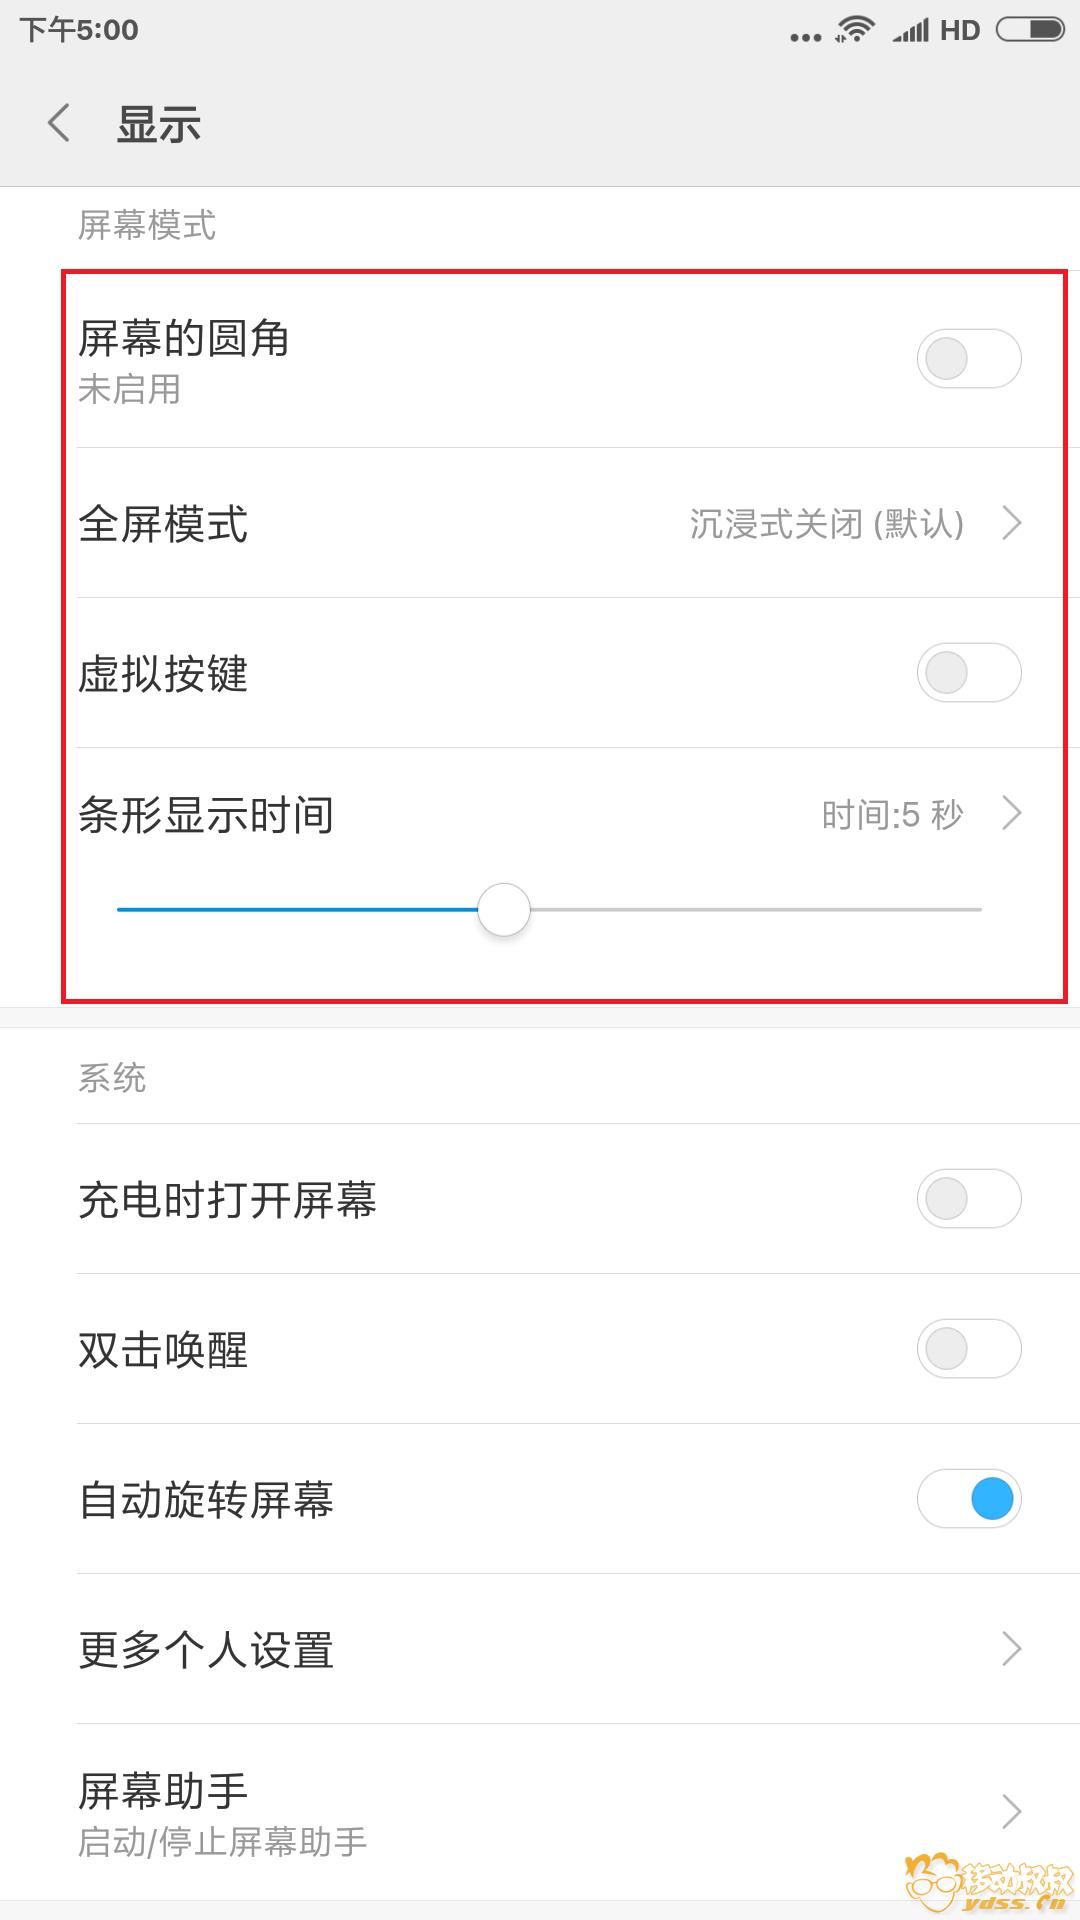 Screenshot_2018-05-19-17-00-13-477_com.android.settings.png